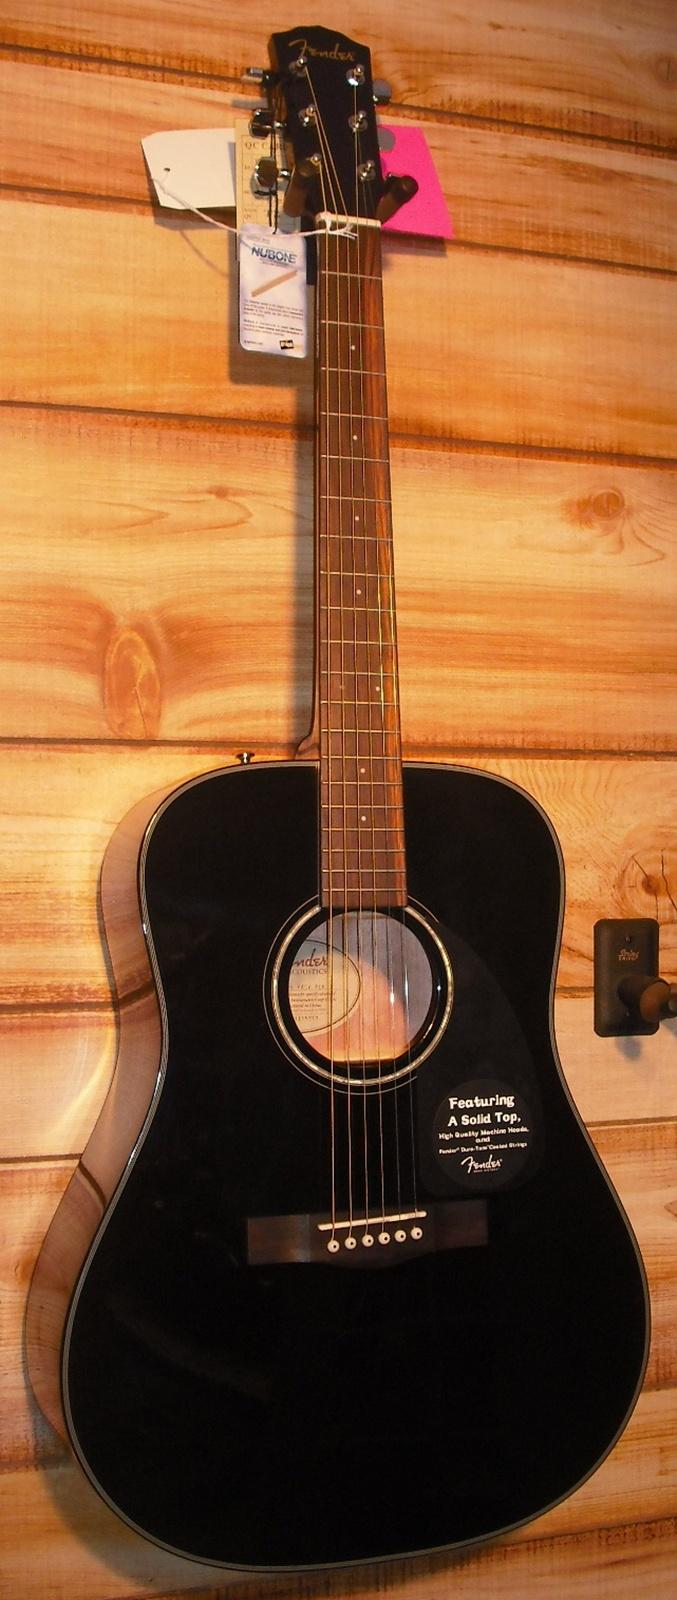 Fender Dg 8s Acoustic Guitar Pack Black